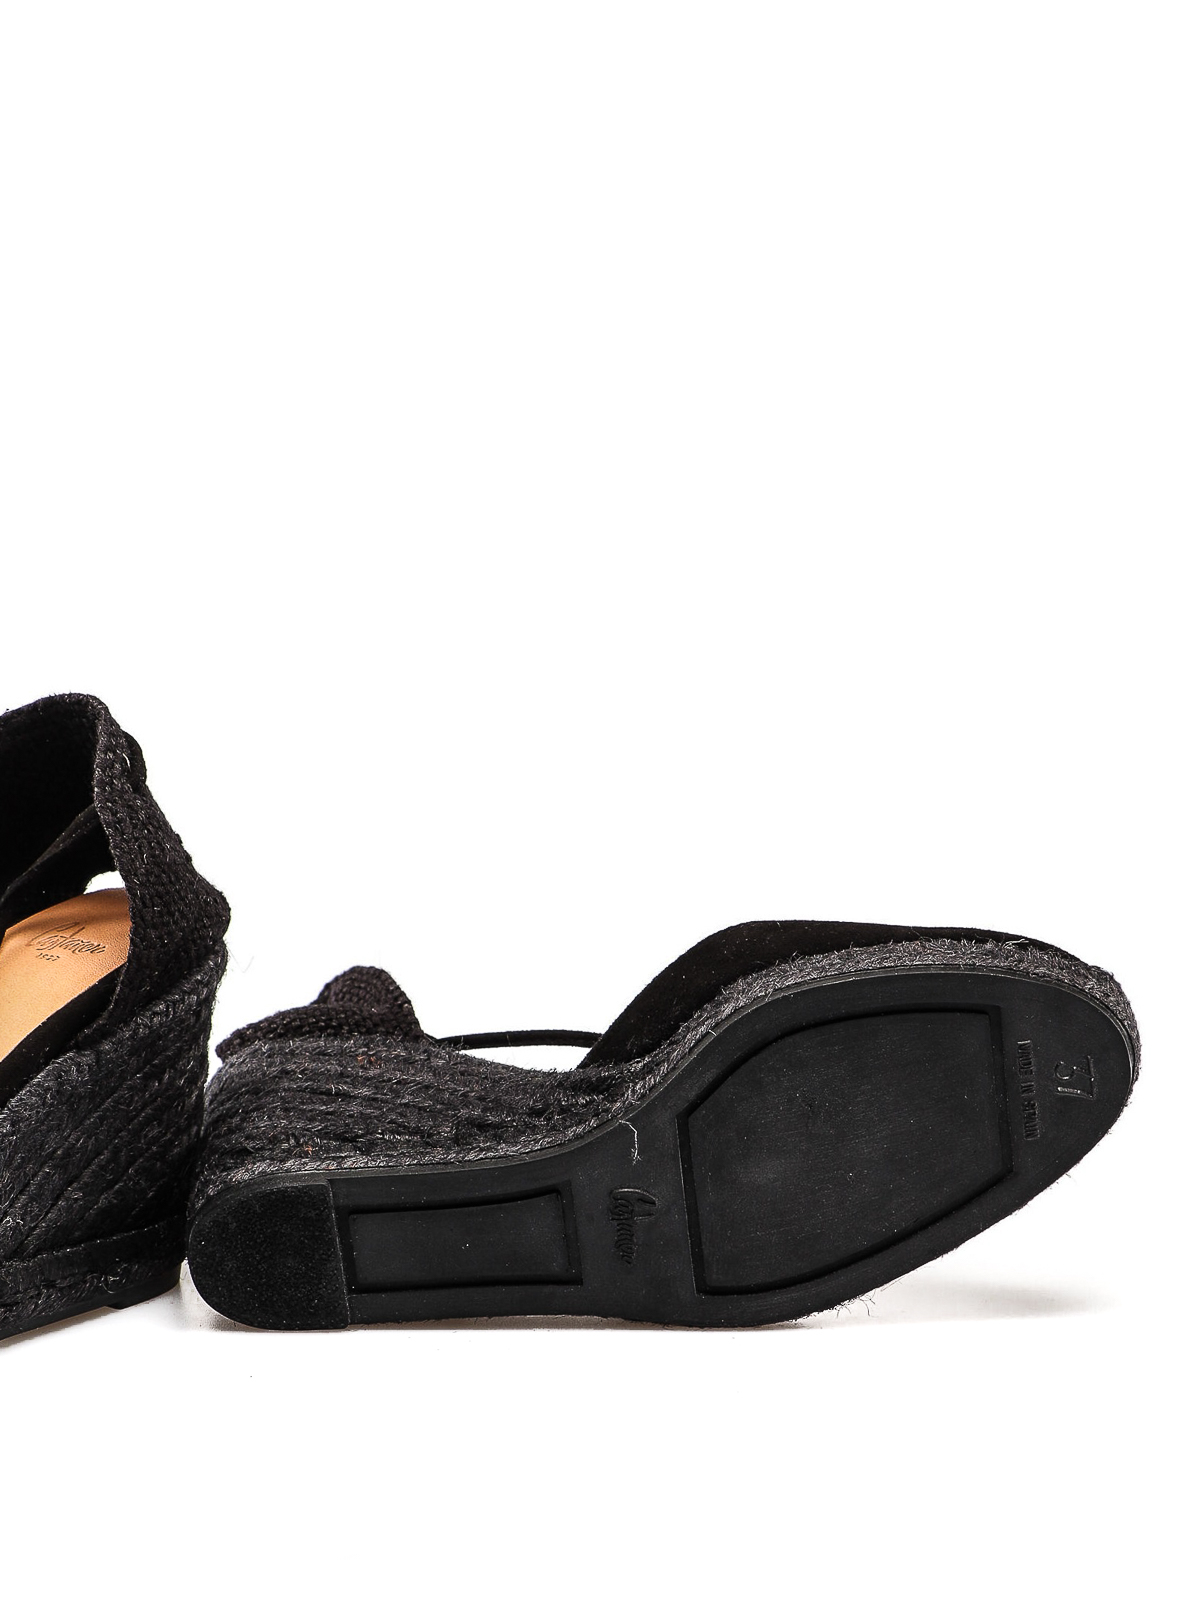 d0981a3fd2d Castaner - Carina black suede wedge espadrilles - espadrilles ...